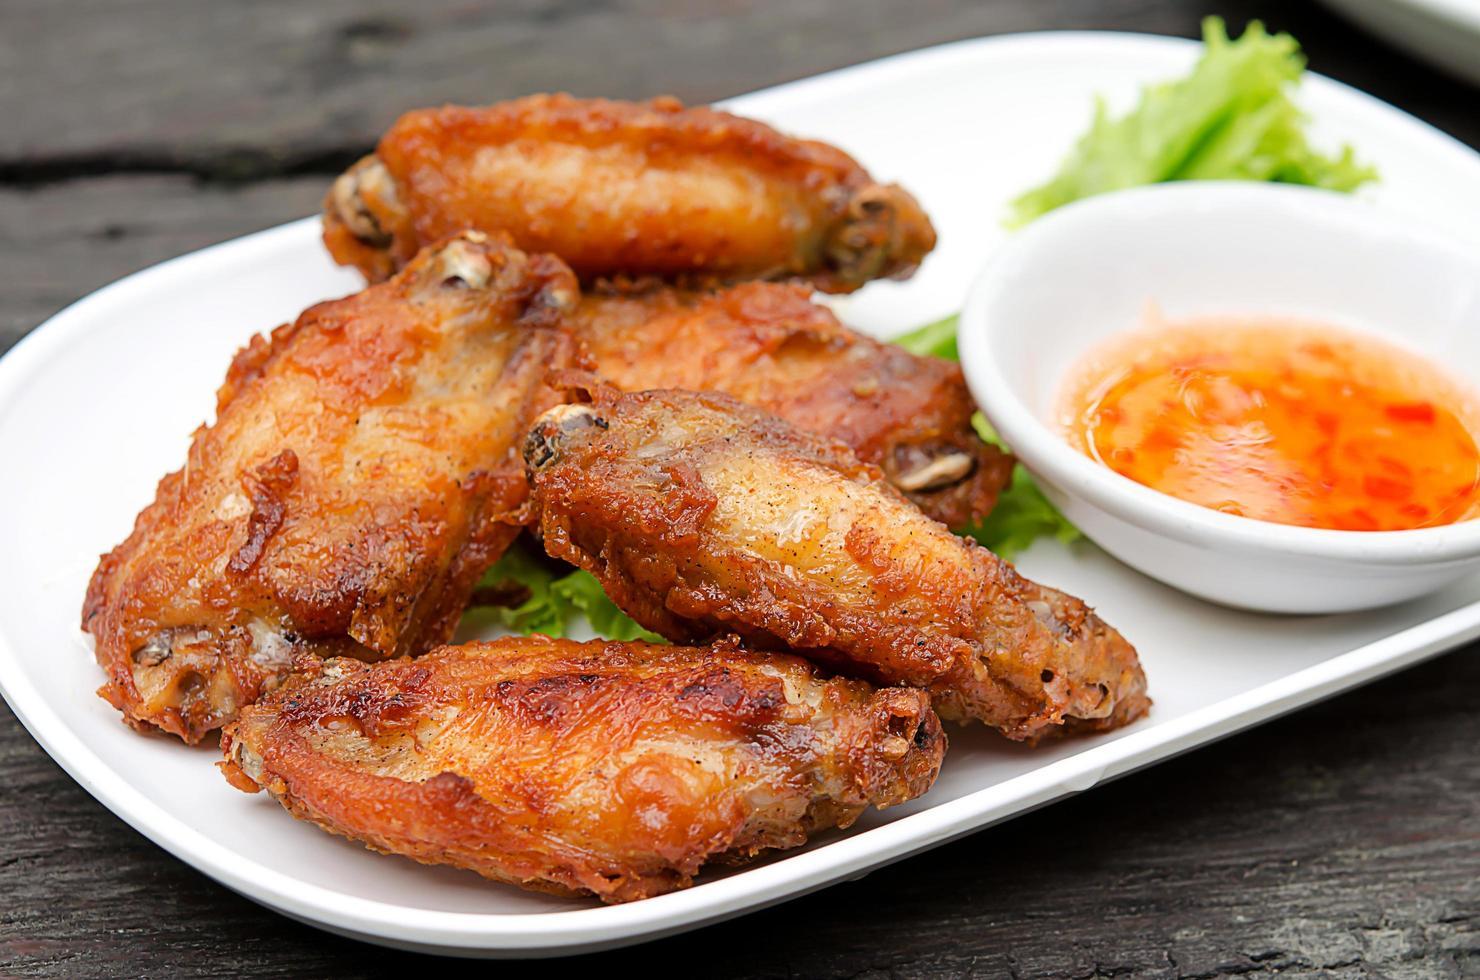 Hühnerflügelmahlzeit foto